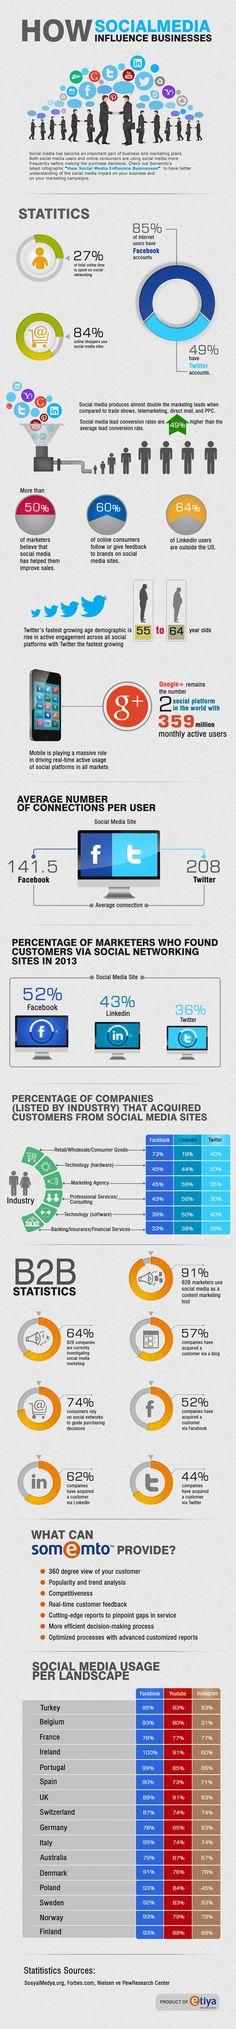 #SocialMedia #Influence on Businesses